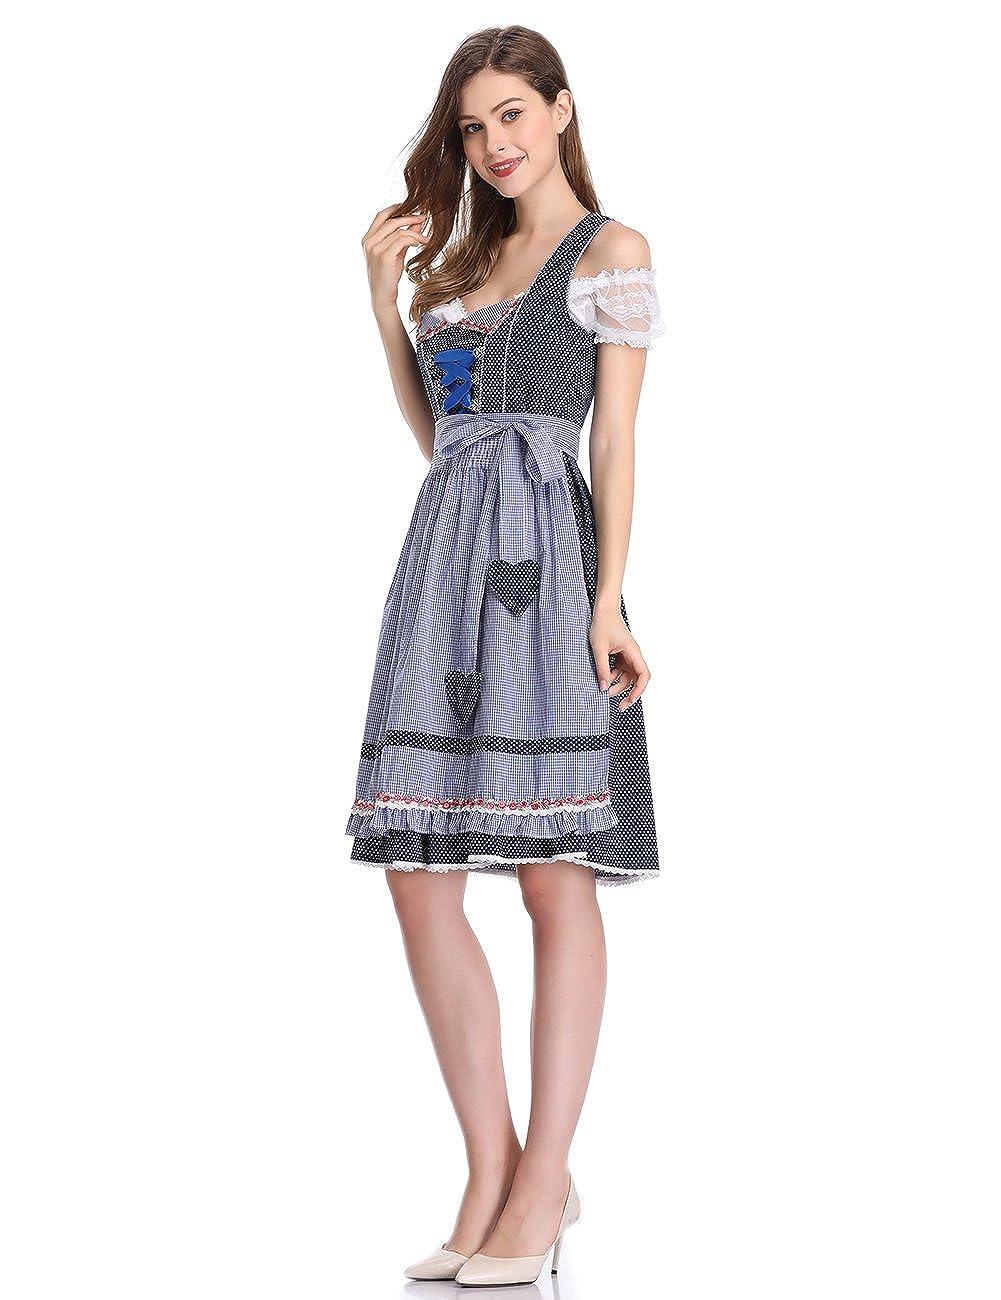 Oktoberfest Costume Midi Dress (3 Pieces:Dress Shirt Apron) for Party Cocktail Dress KOJOOIN Women Dirndl Dress Formal Dress